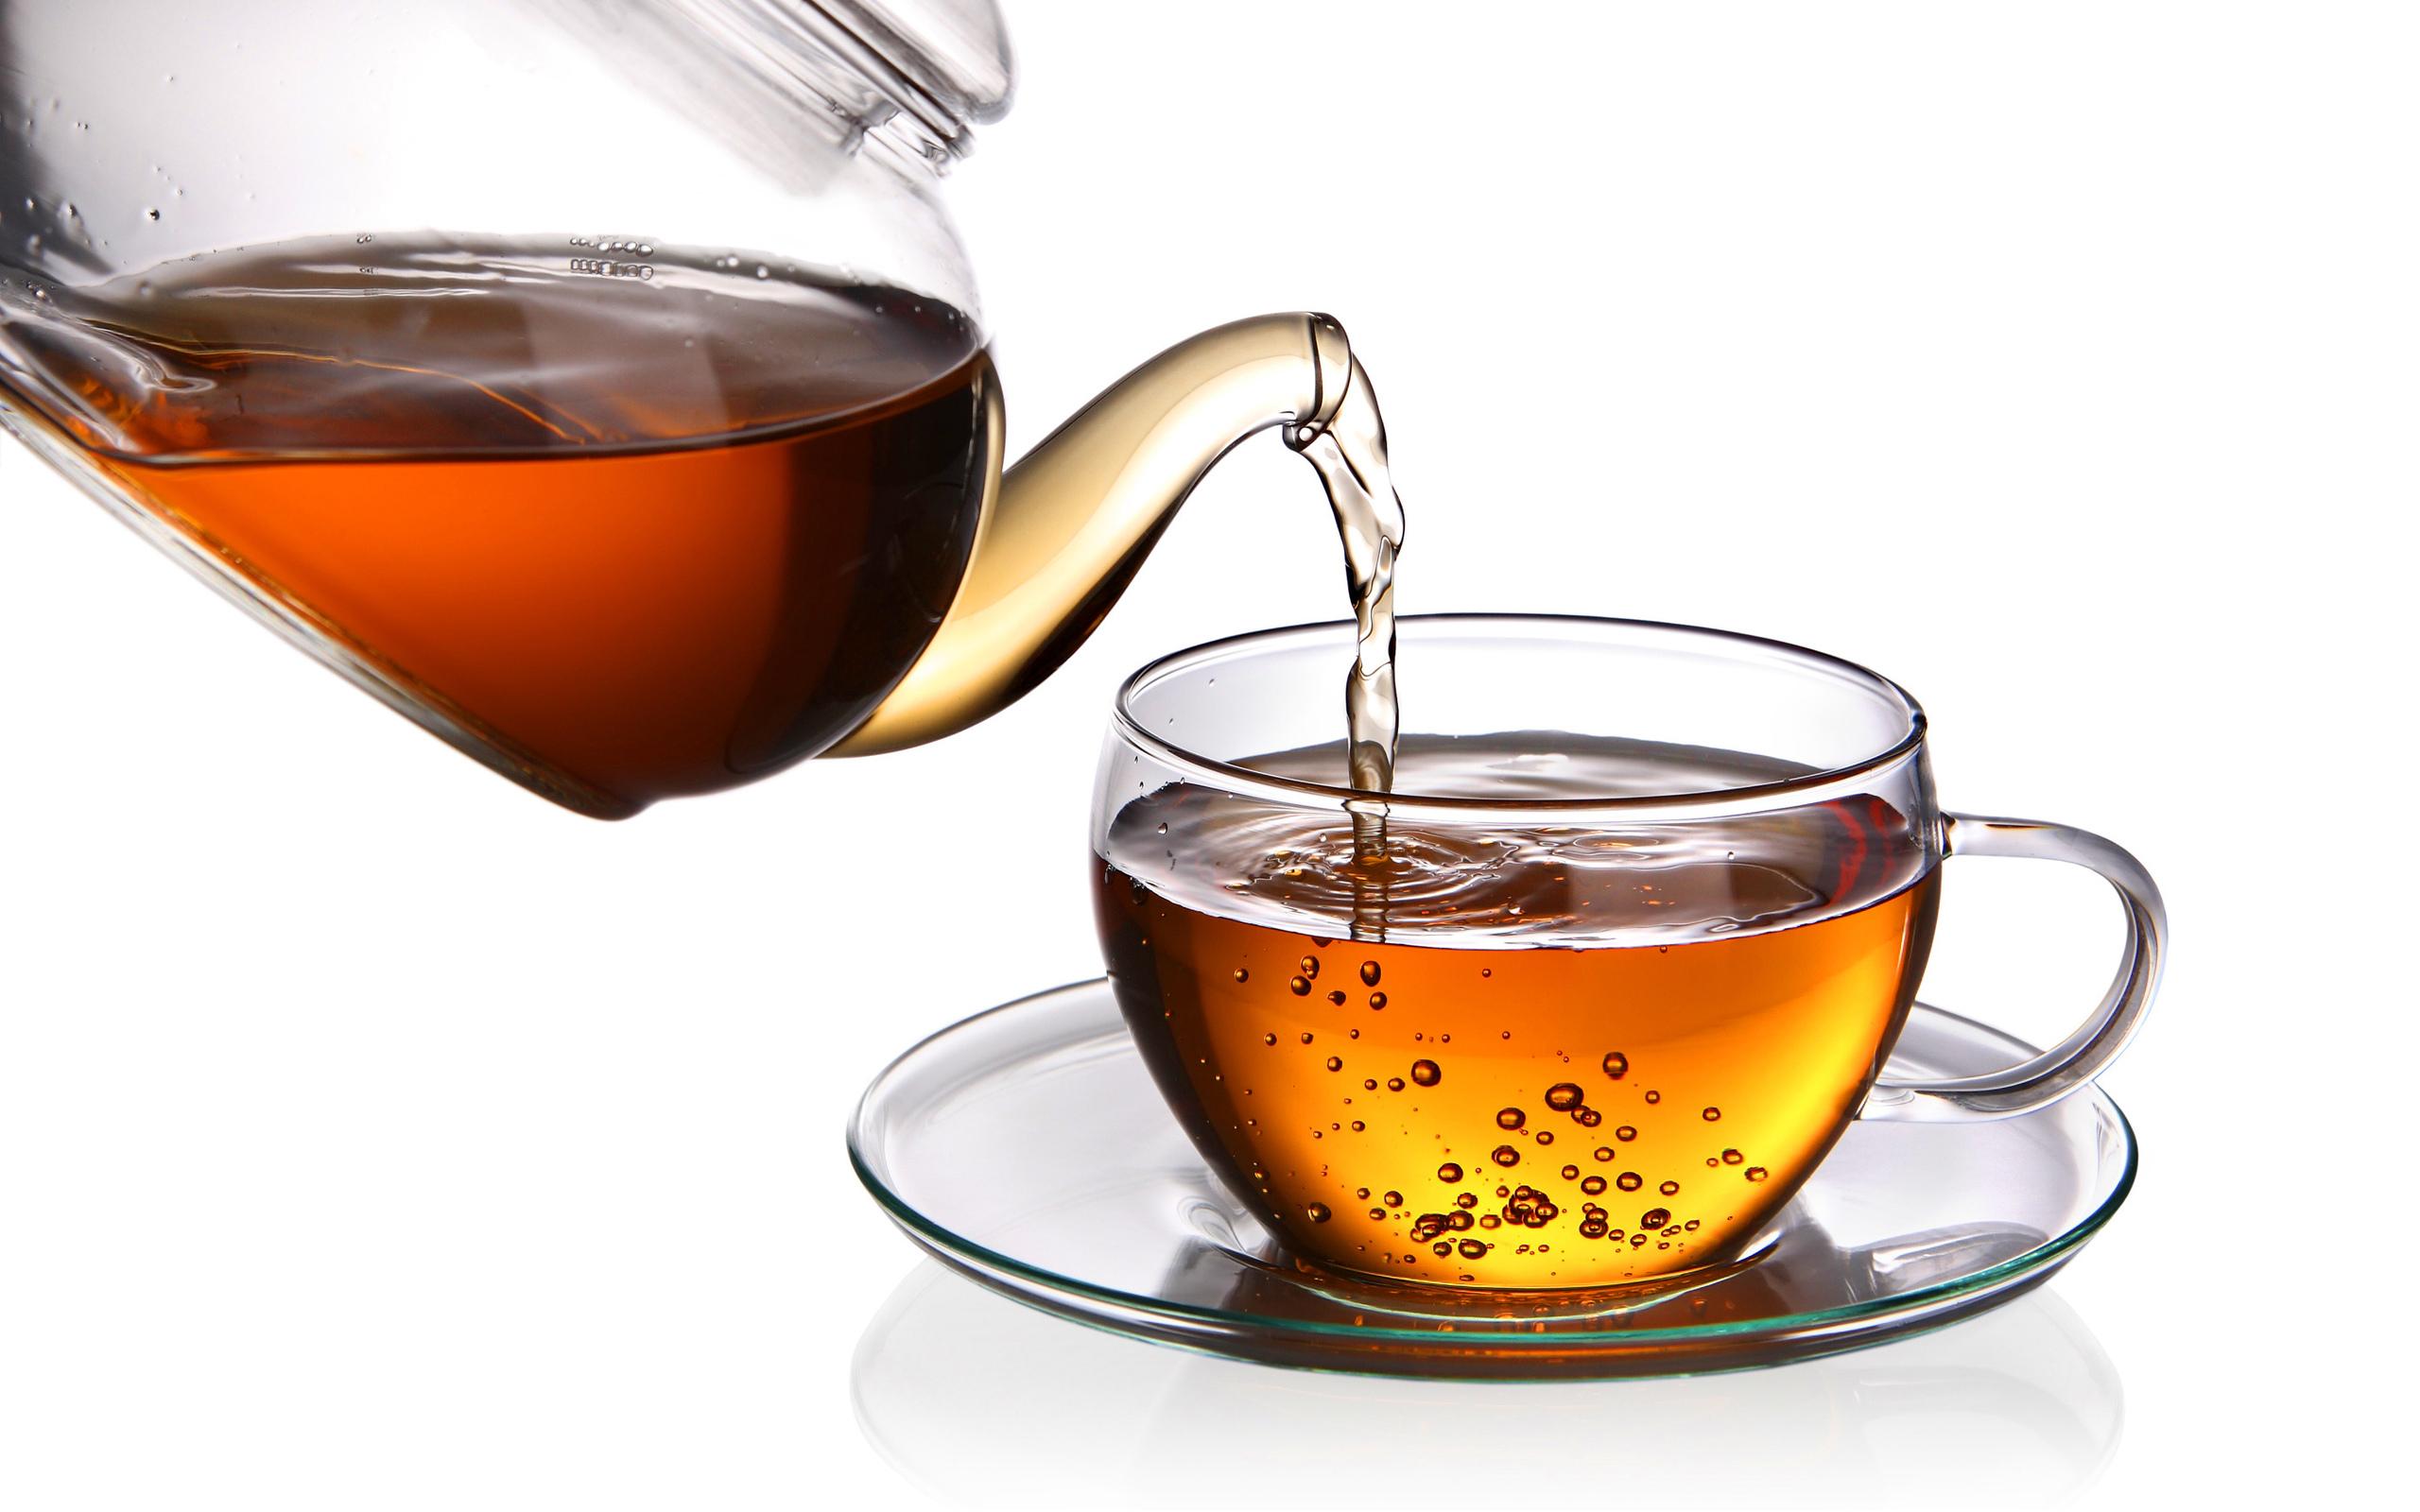 Чай и кофе картинки